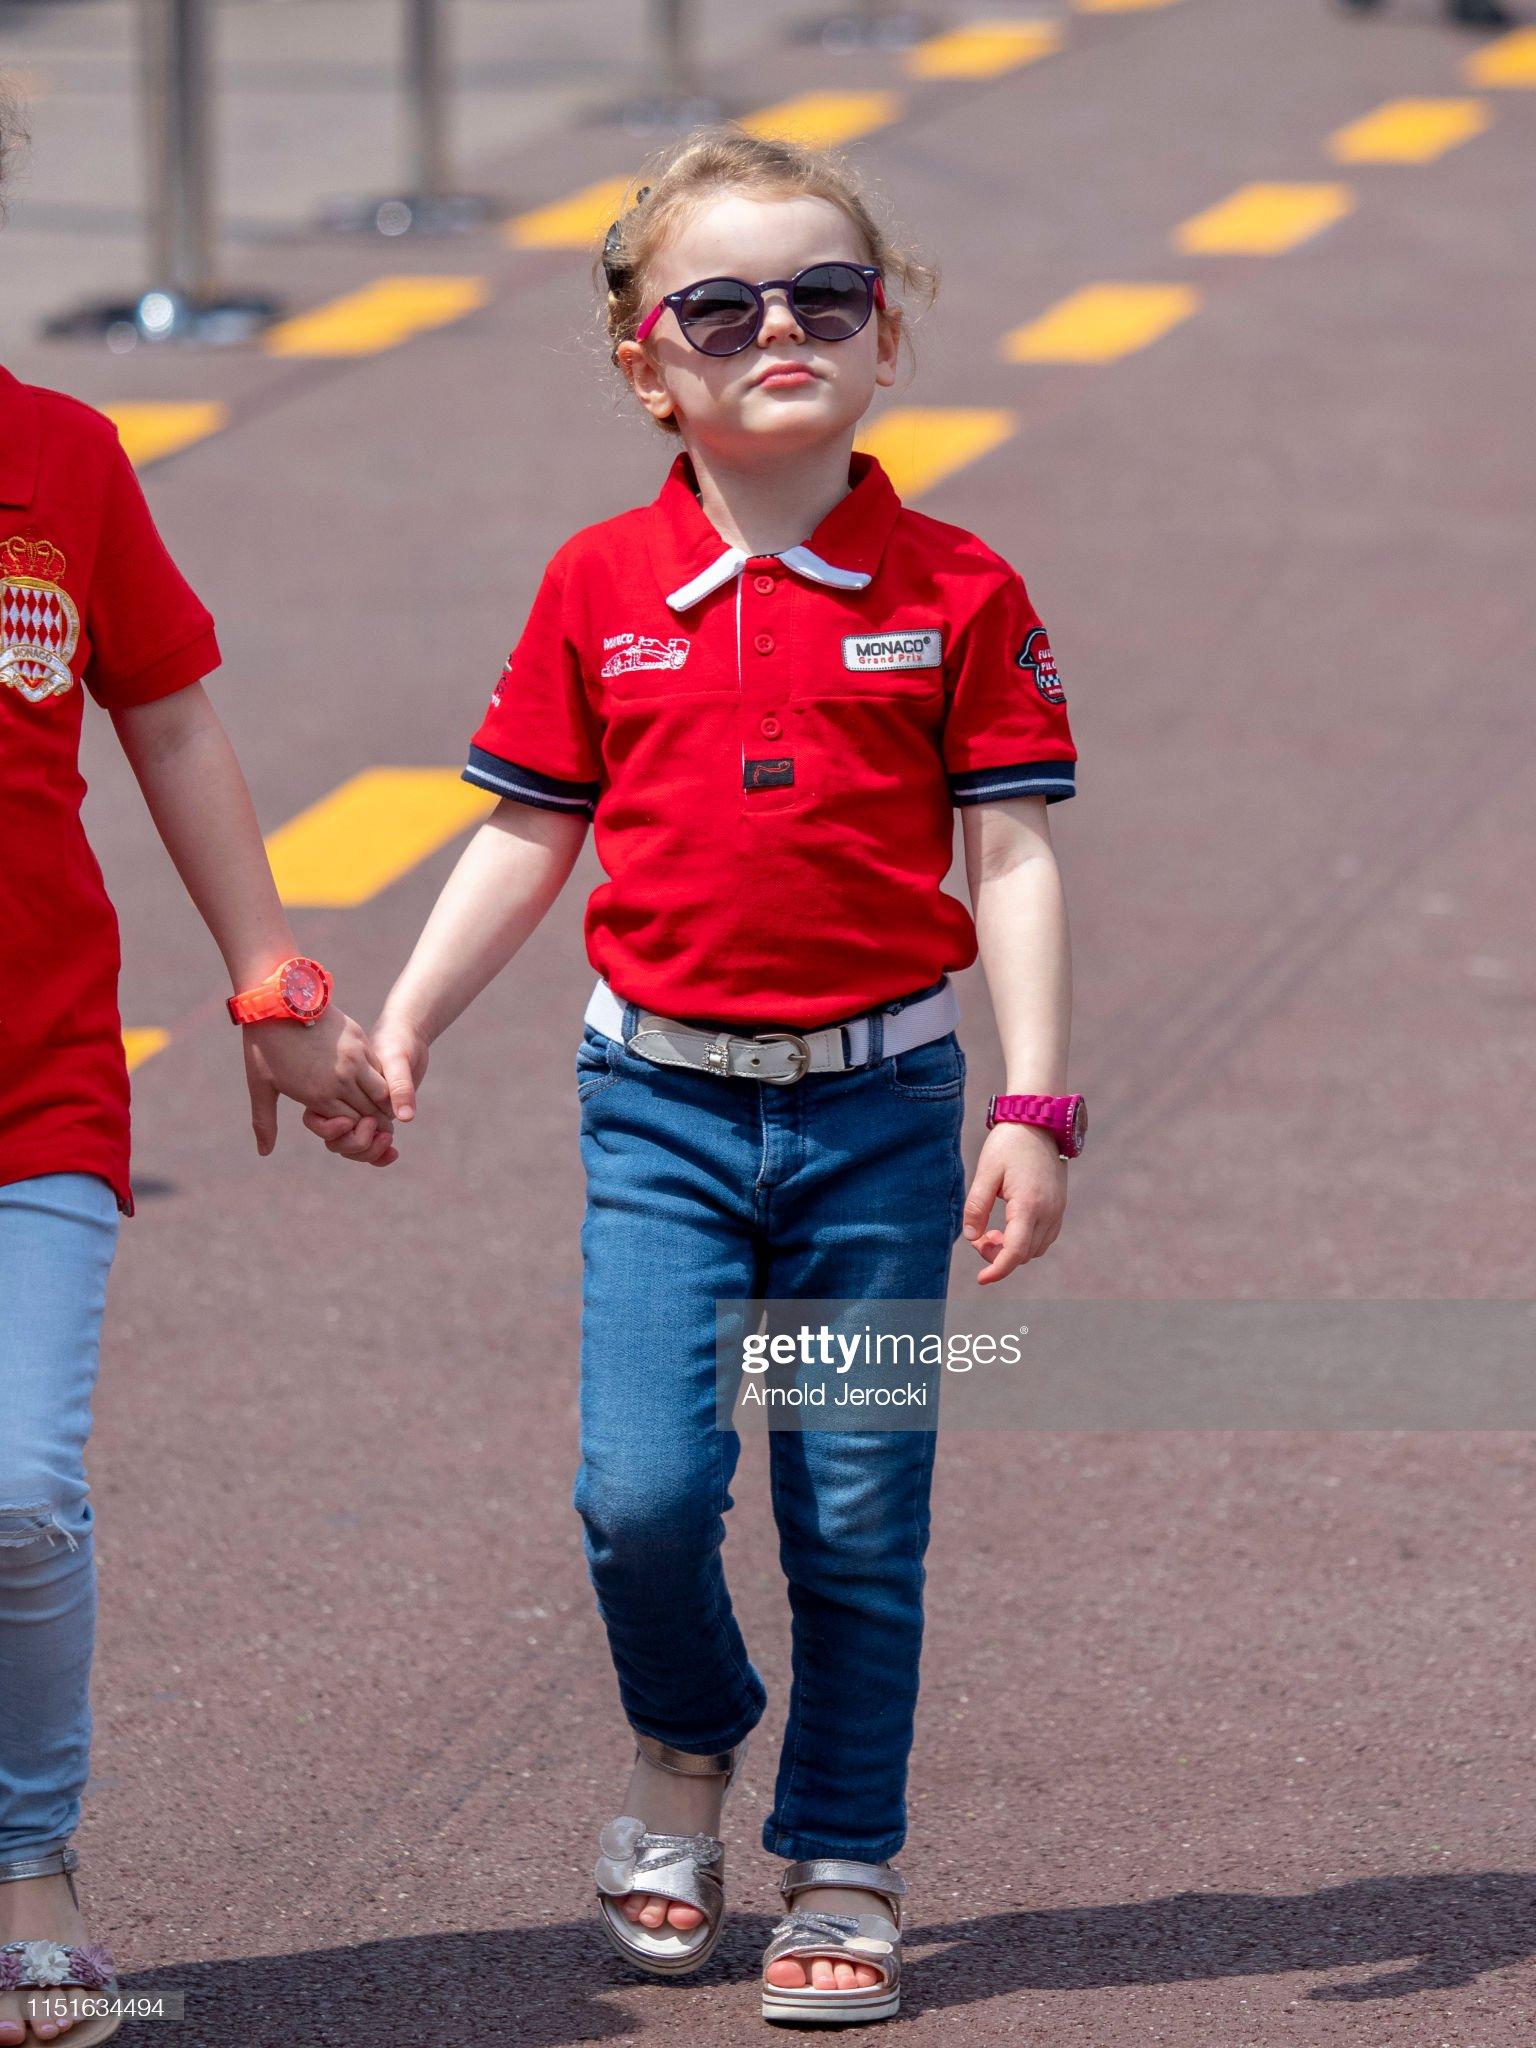 princess-gabriella-attends-the-f1-grand-prix-of-monaco-qualifying-on-picture-id1151634494